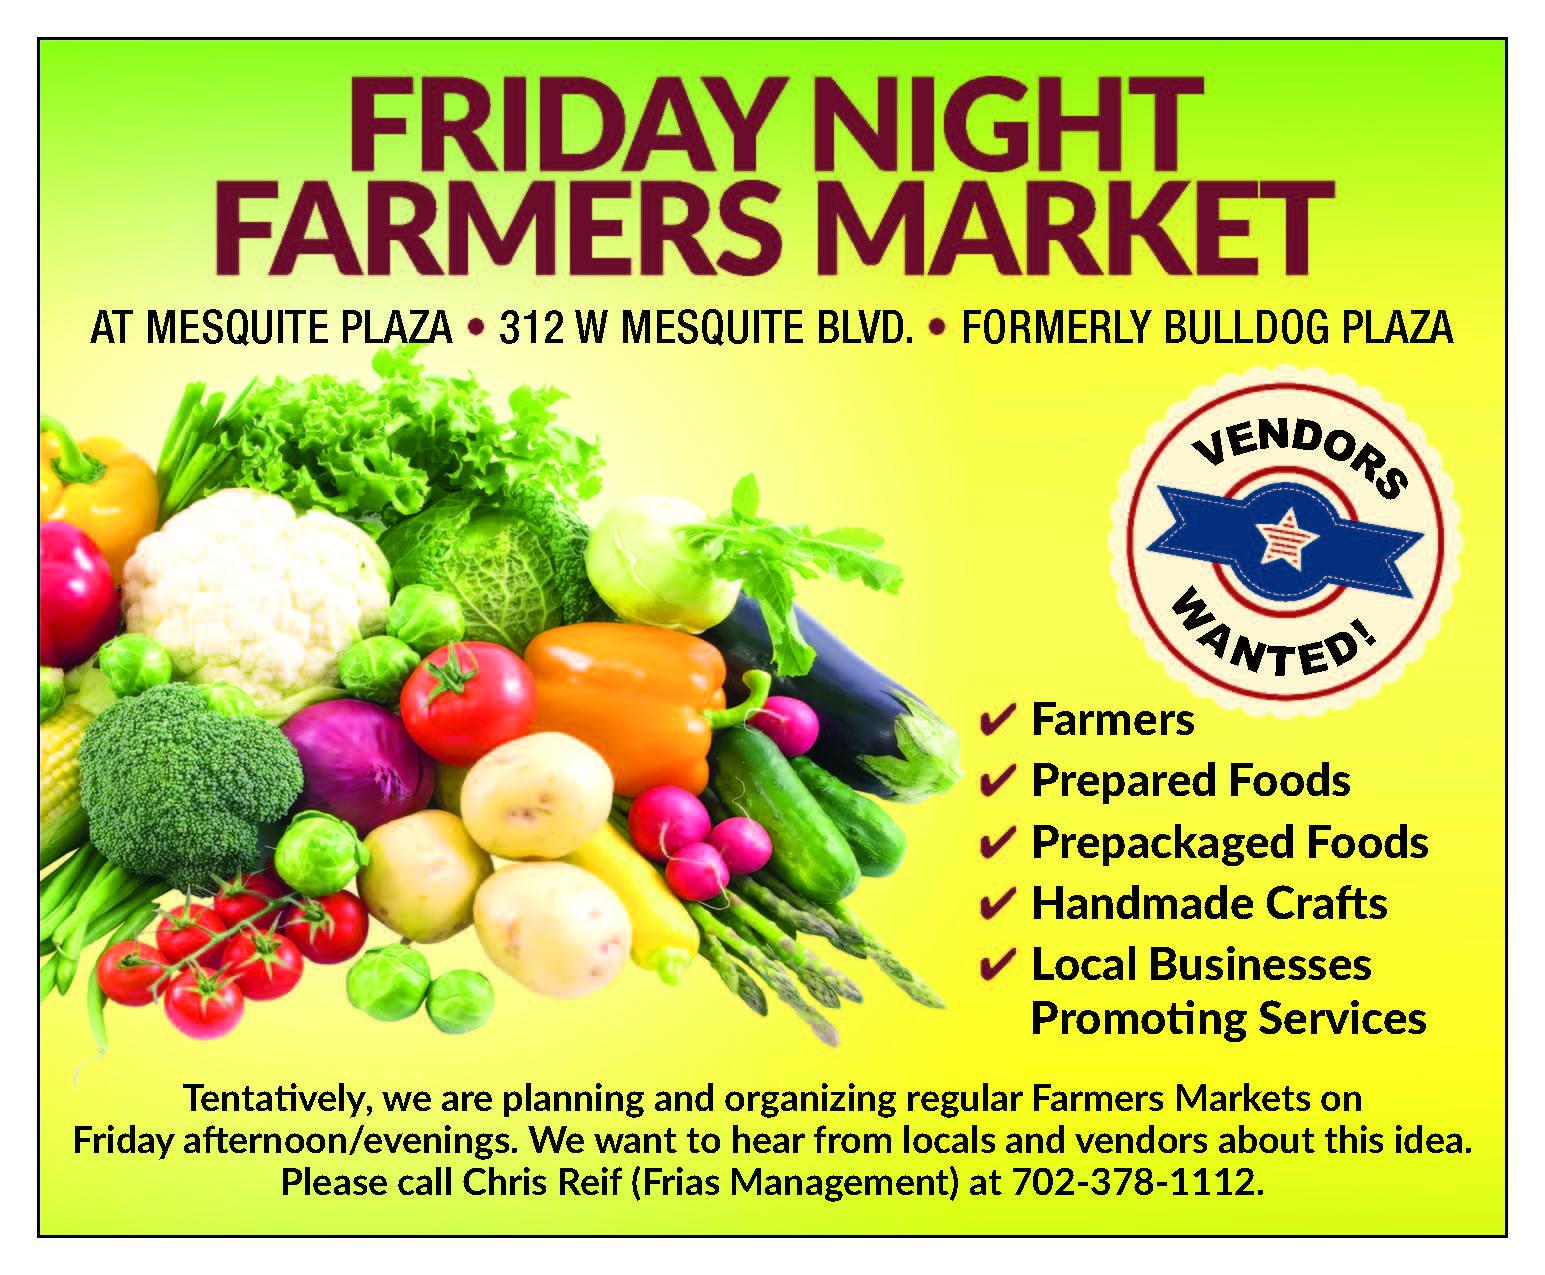 Second Farmers Market bringing in more vendors